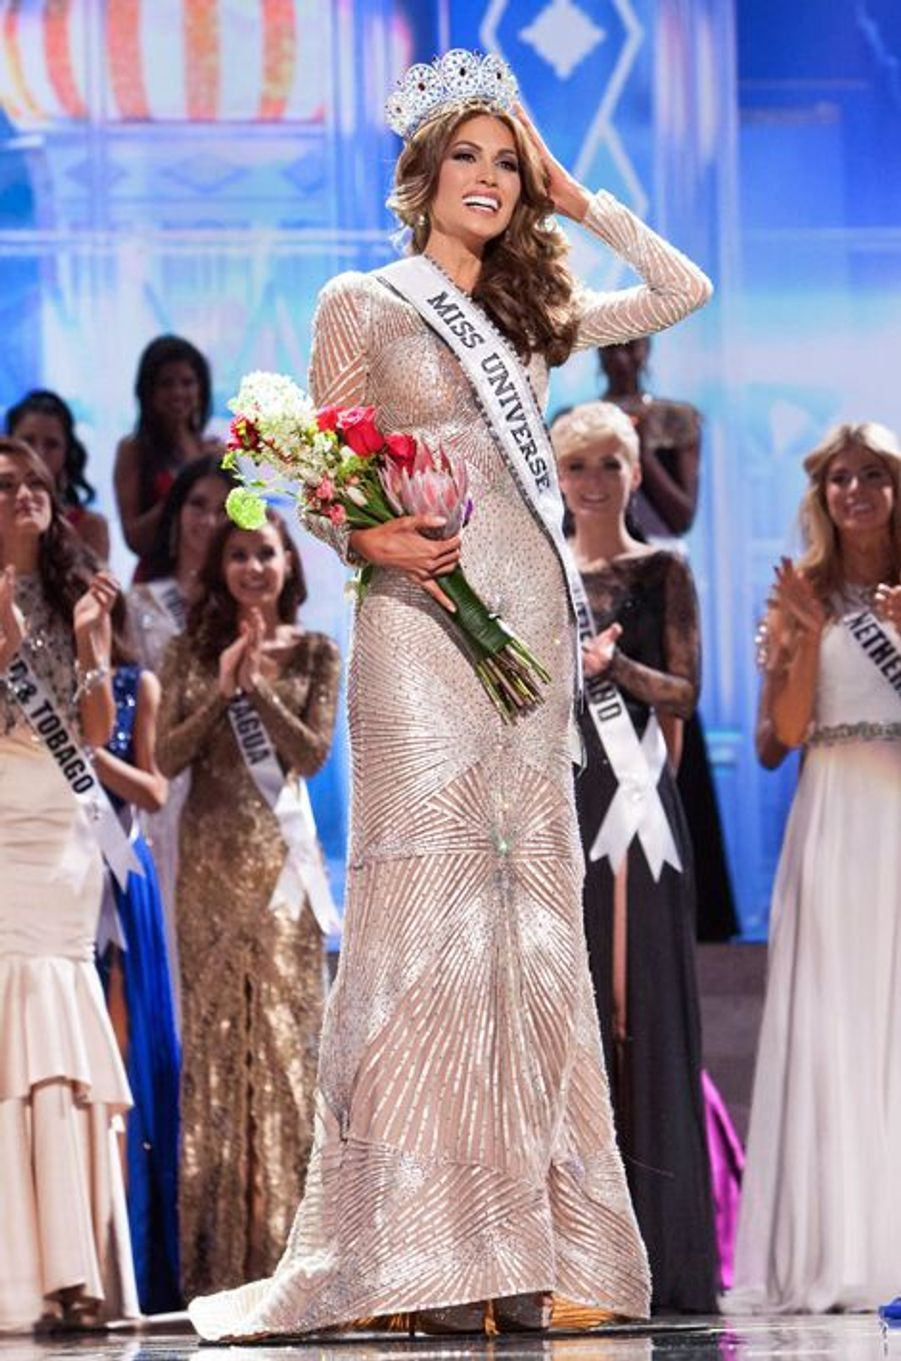 Maria Gabriela Isler, Miss Venezuela élue Miss Univers 2013